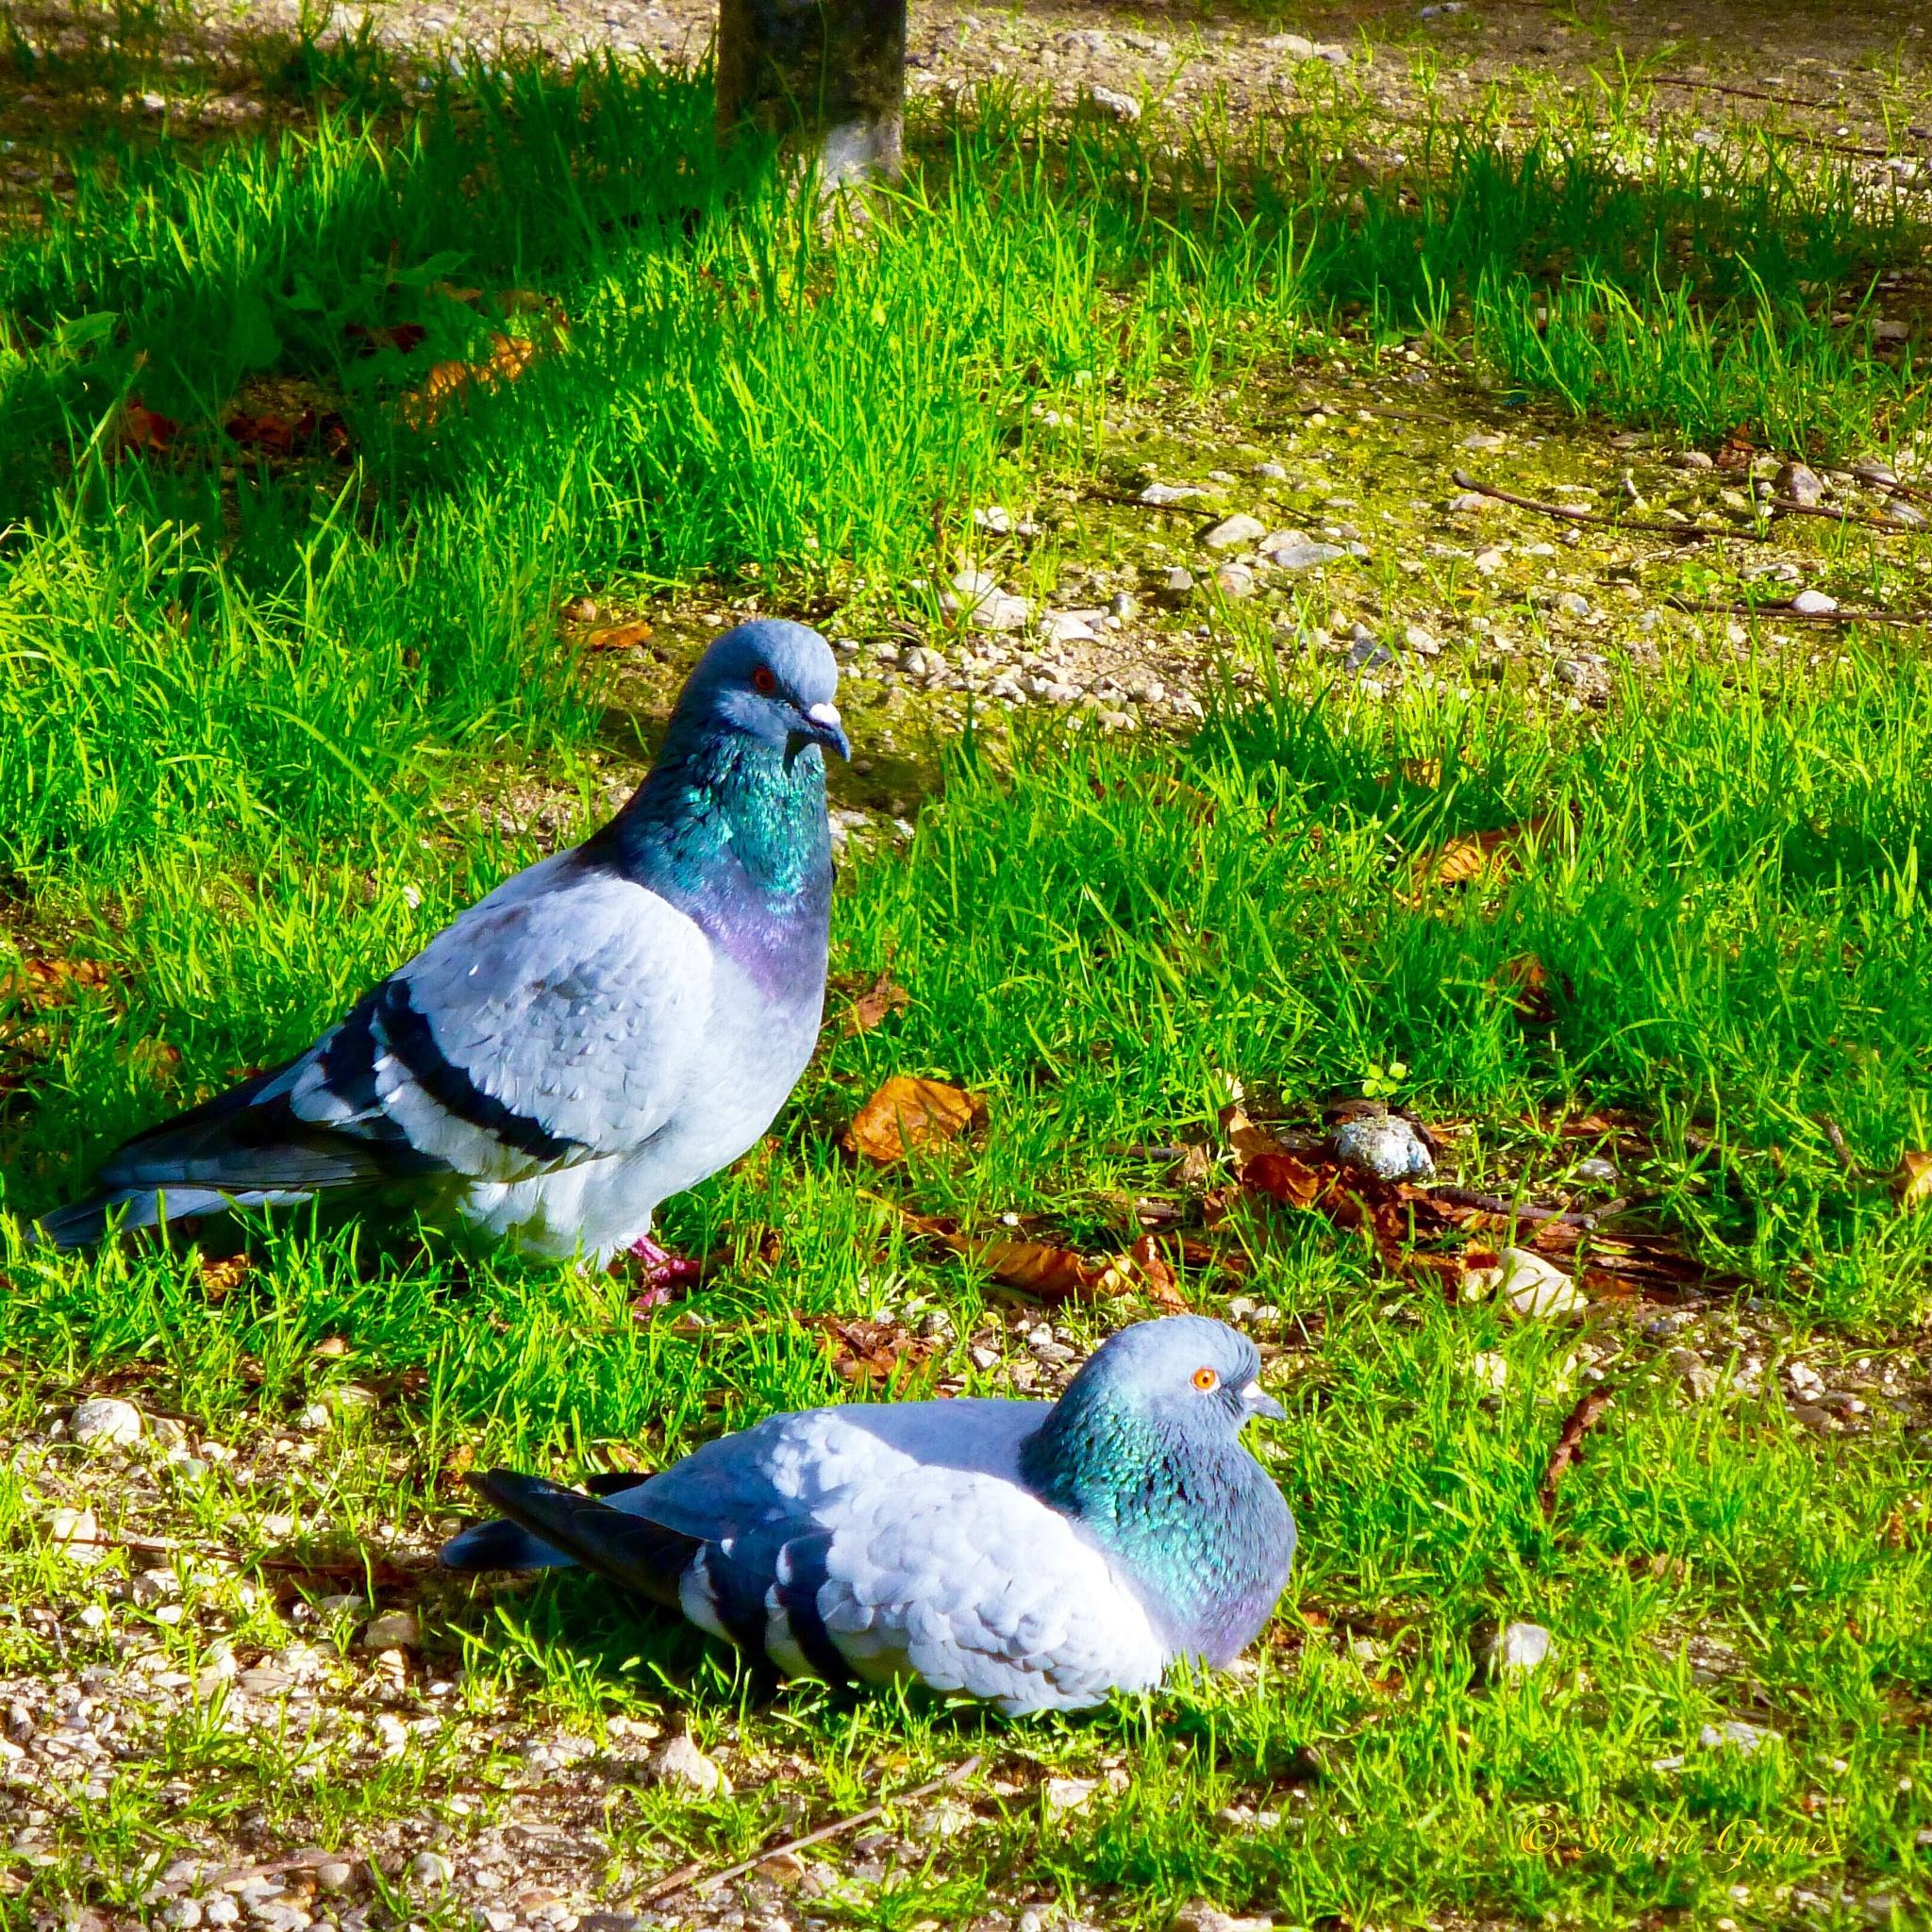 Parisian Pigeons by TrixieGirl5192